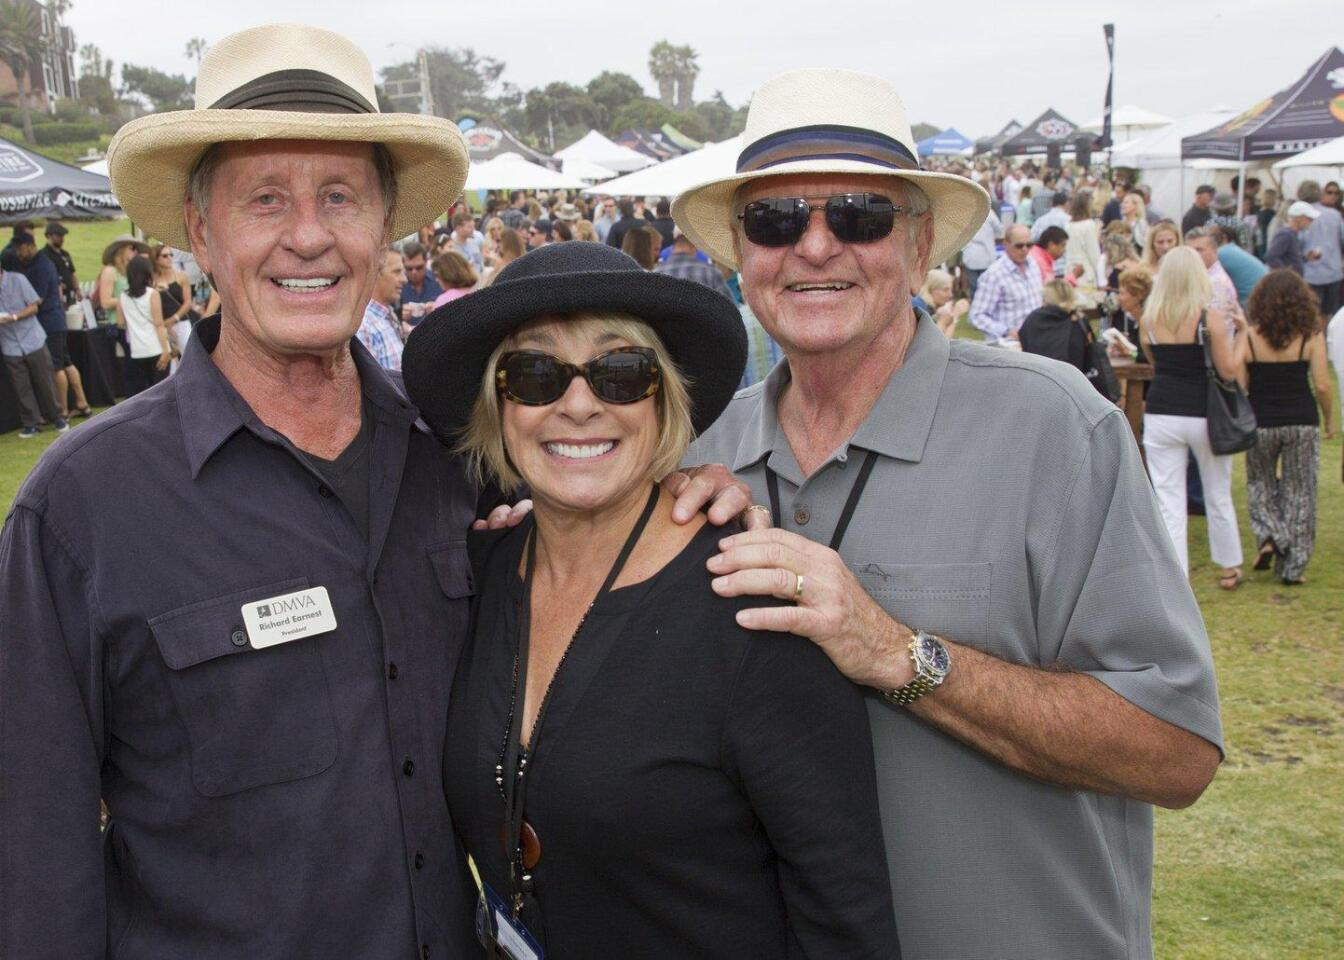 Richard Earnest, Karen Powell, Jim Coleman